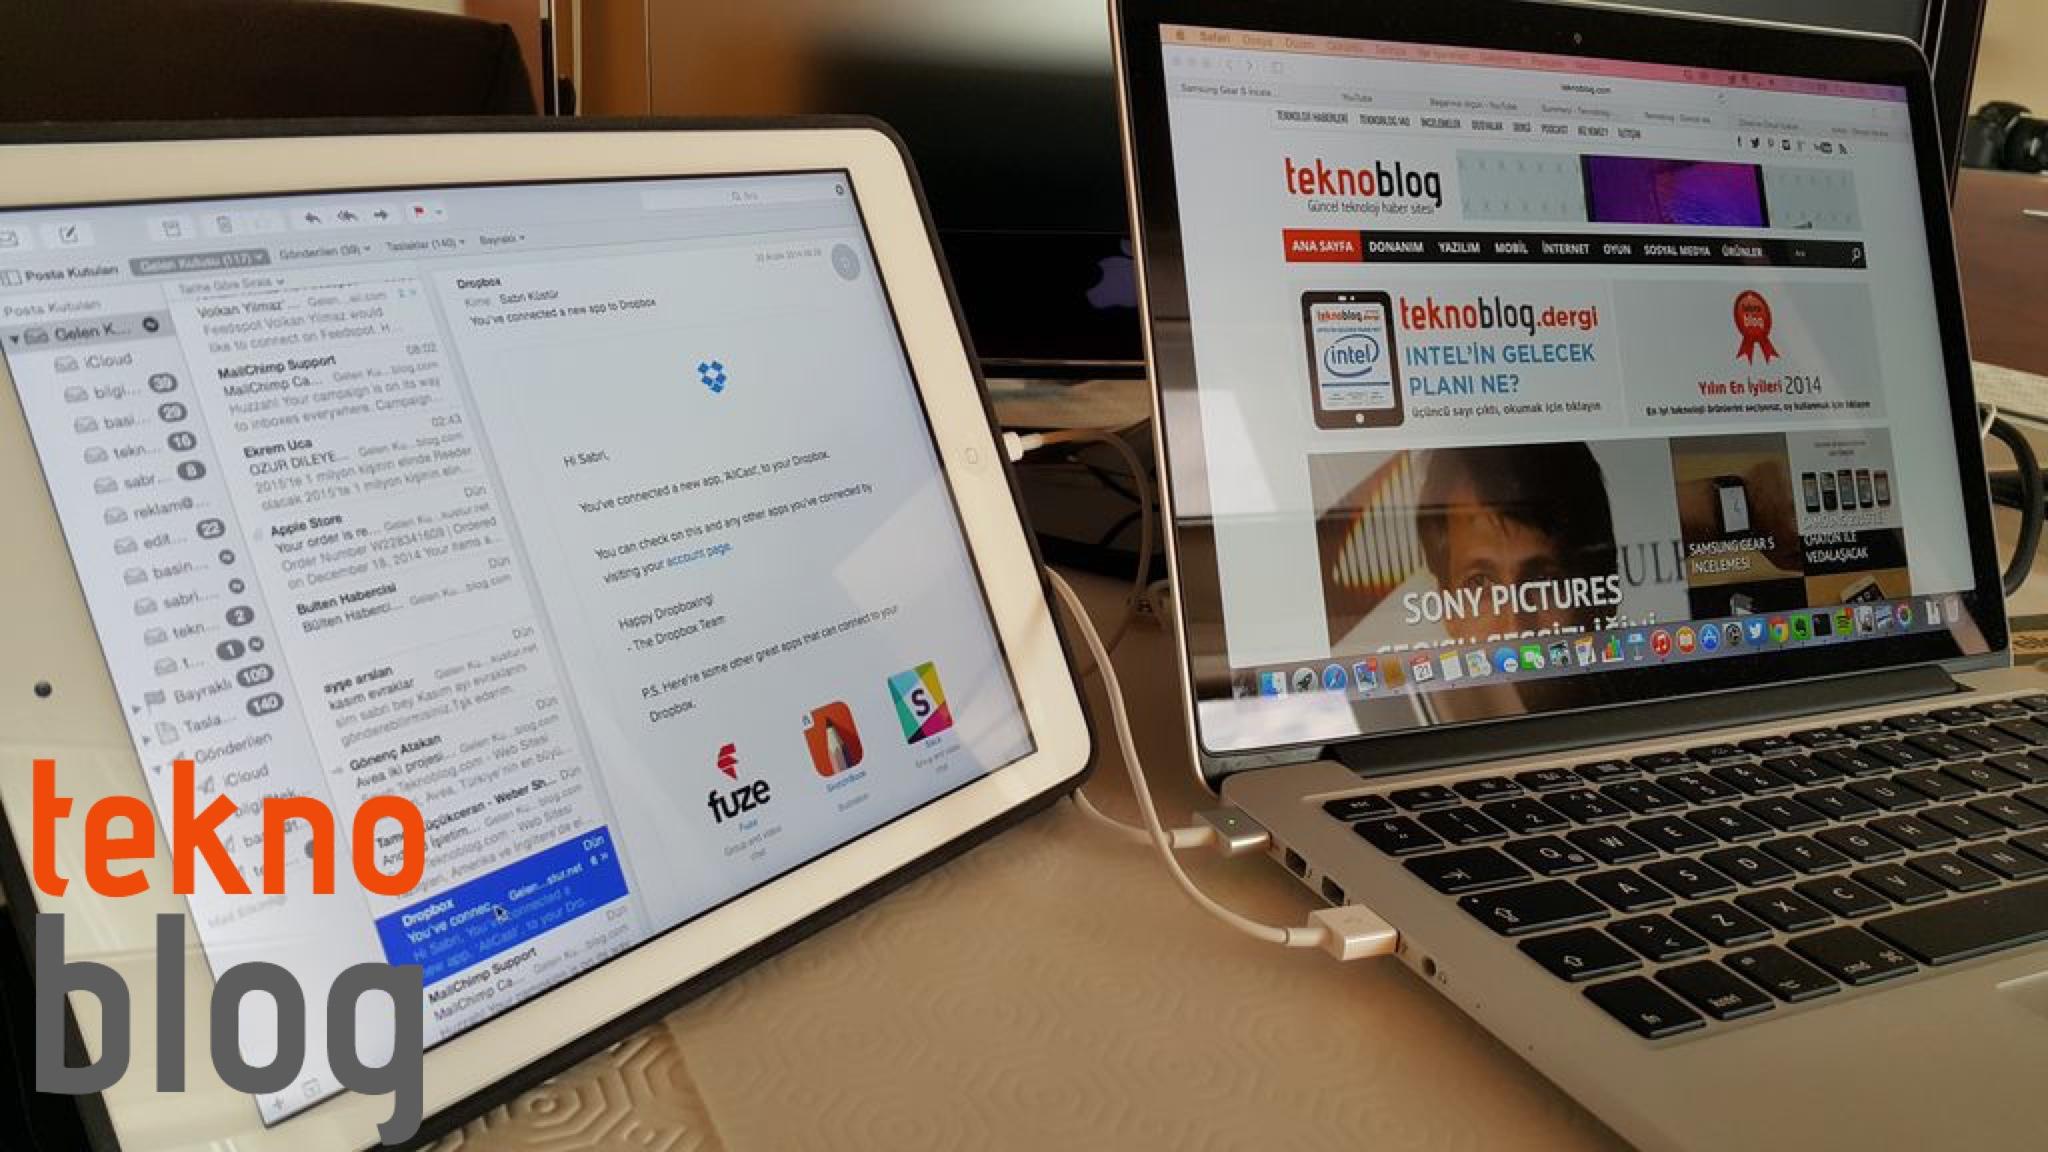 ipad-macbook-duet-display-21121401